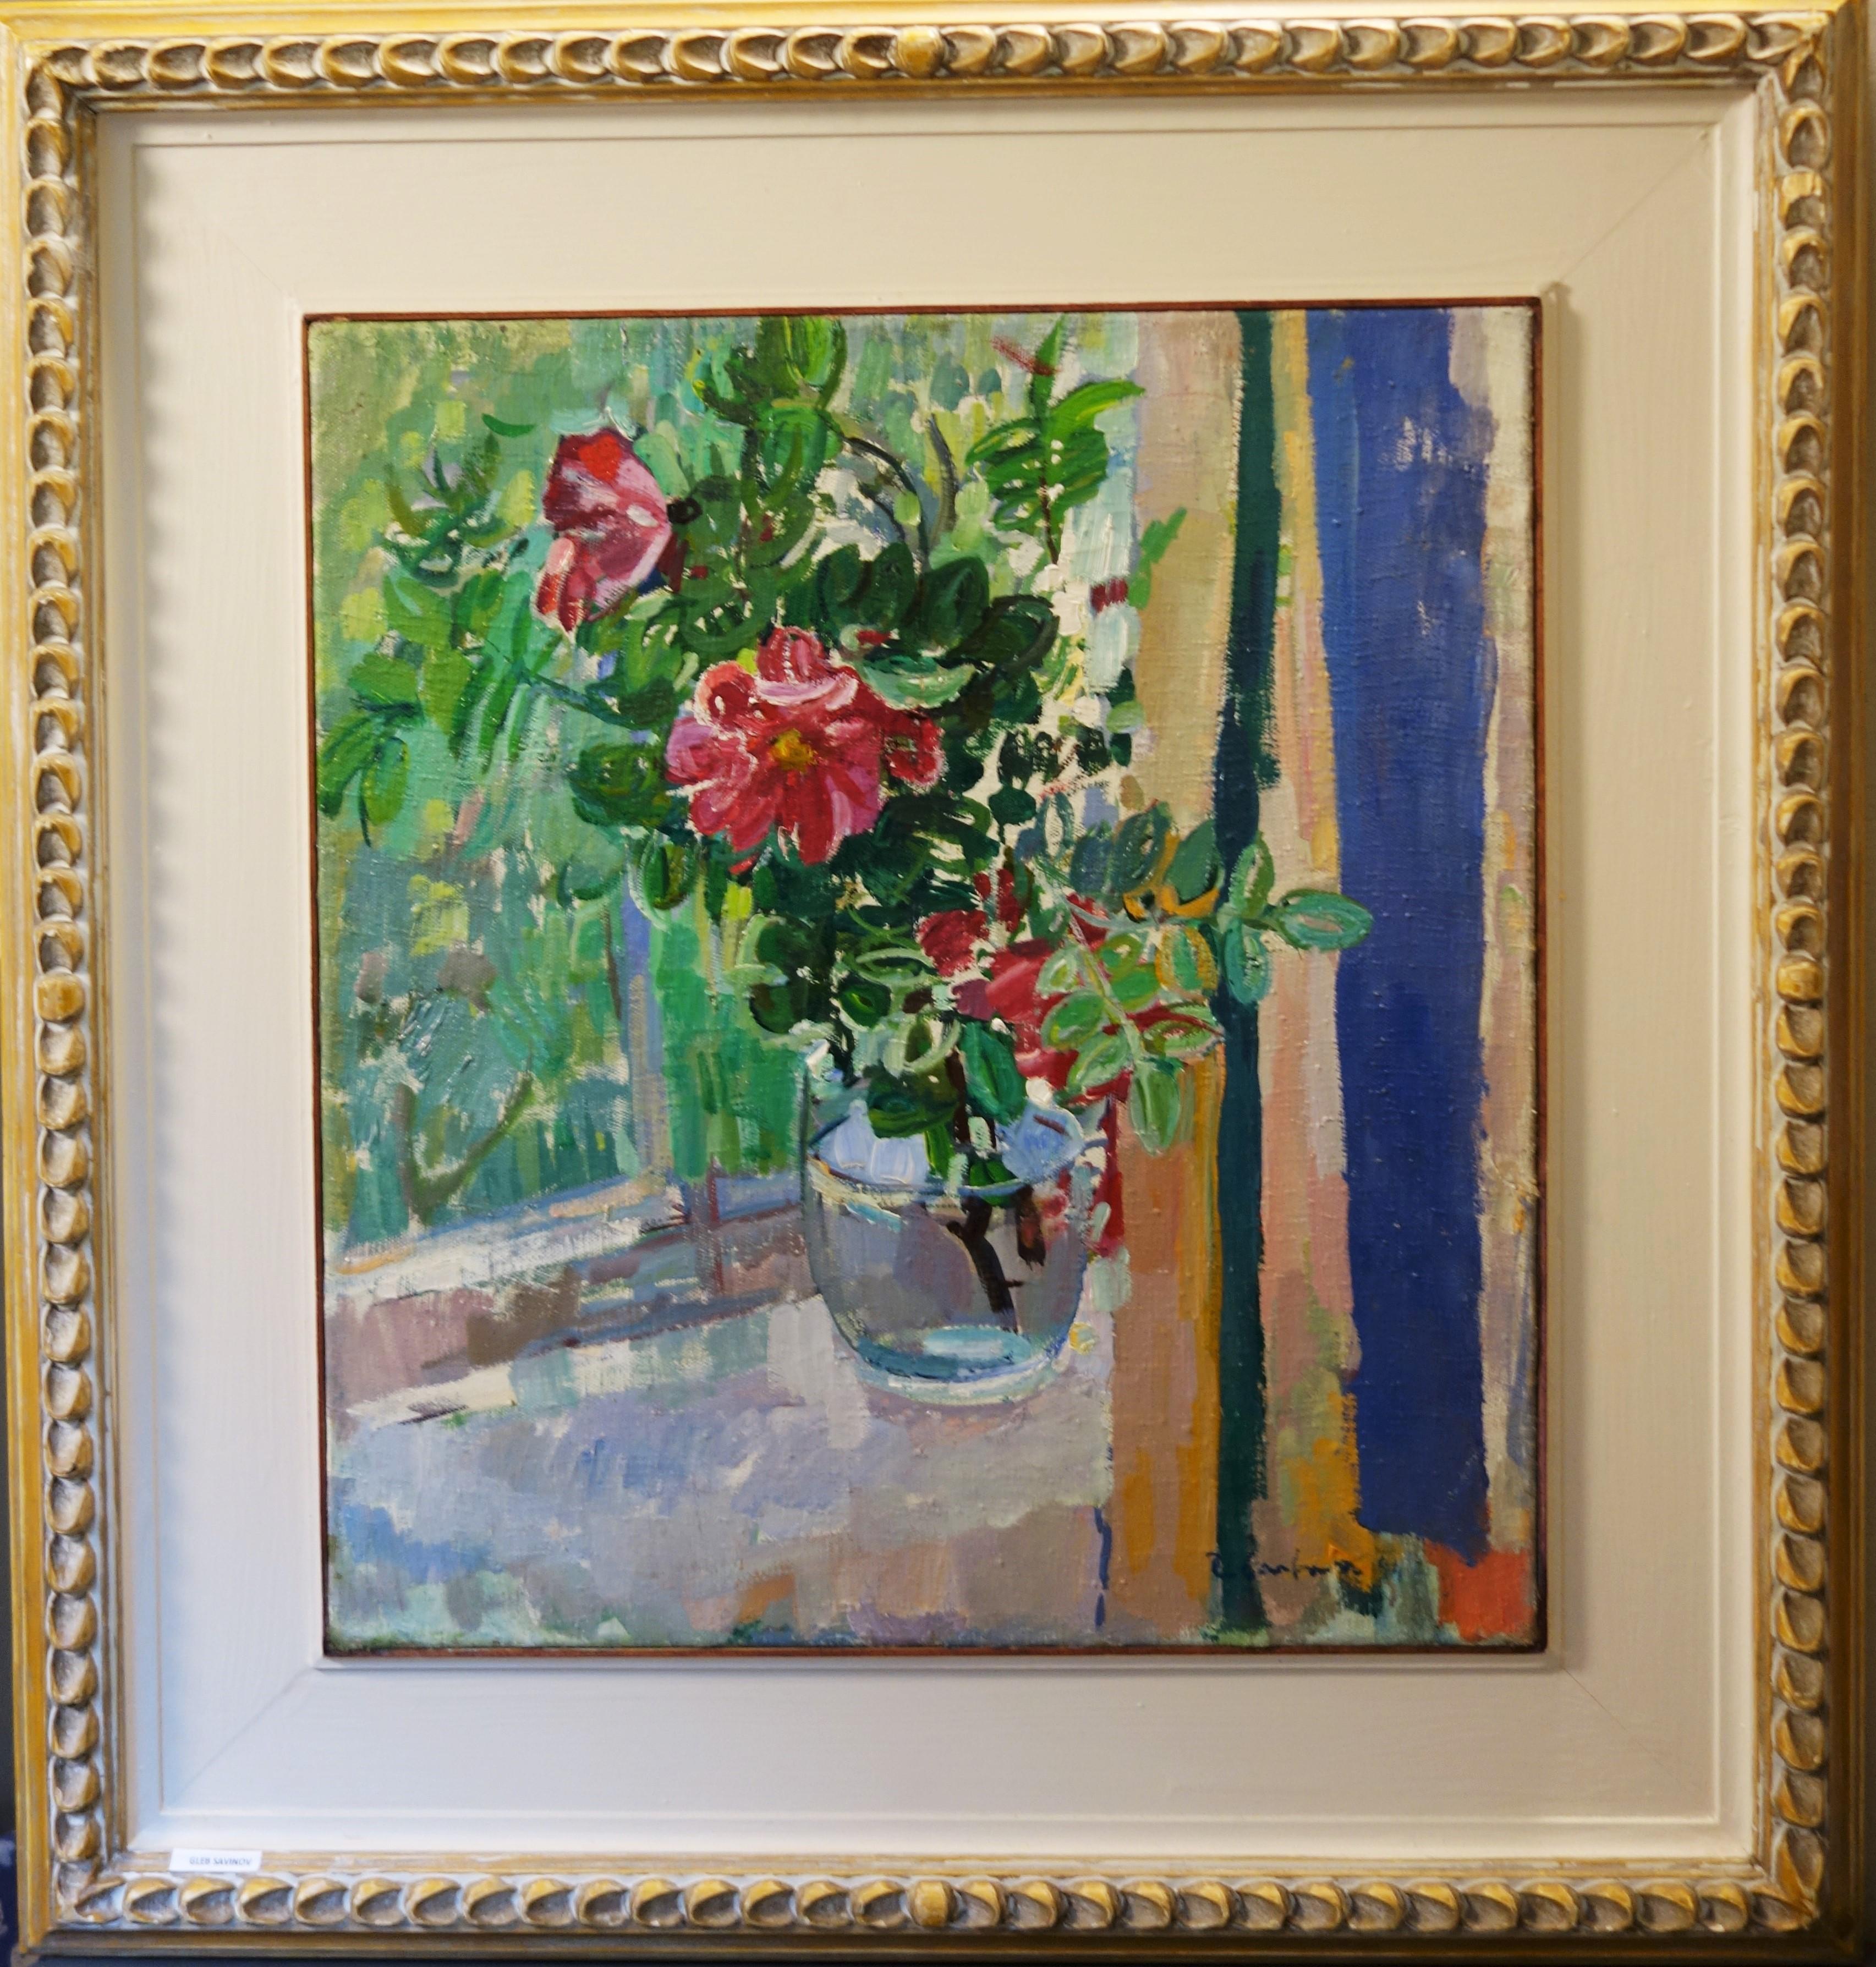 """Pink Wild Roses on the windowsill""Oil cm 55 x 50 1994"